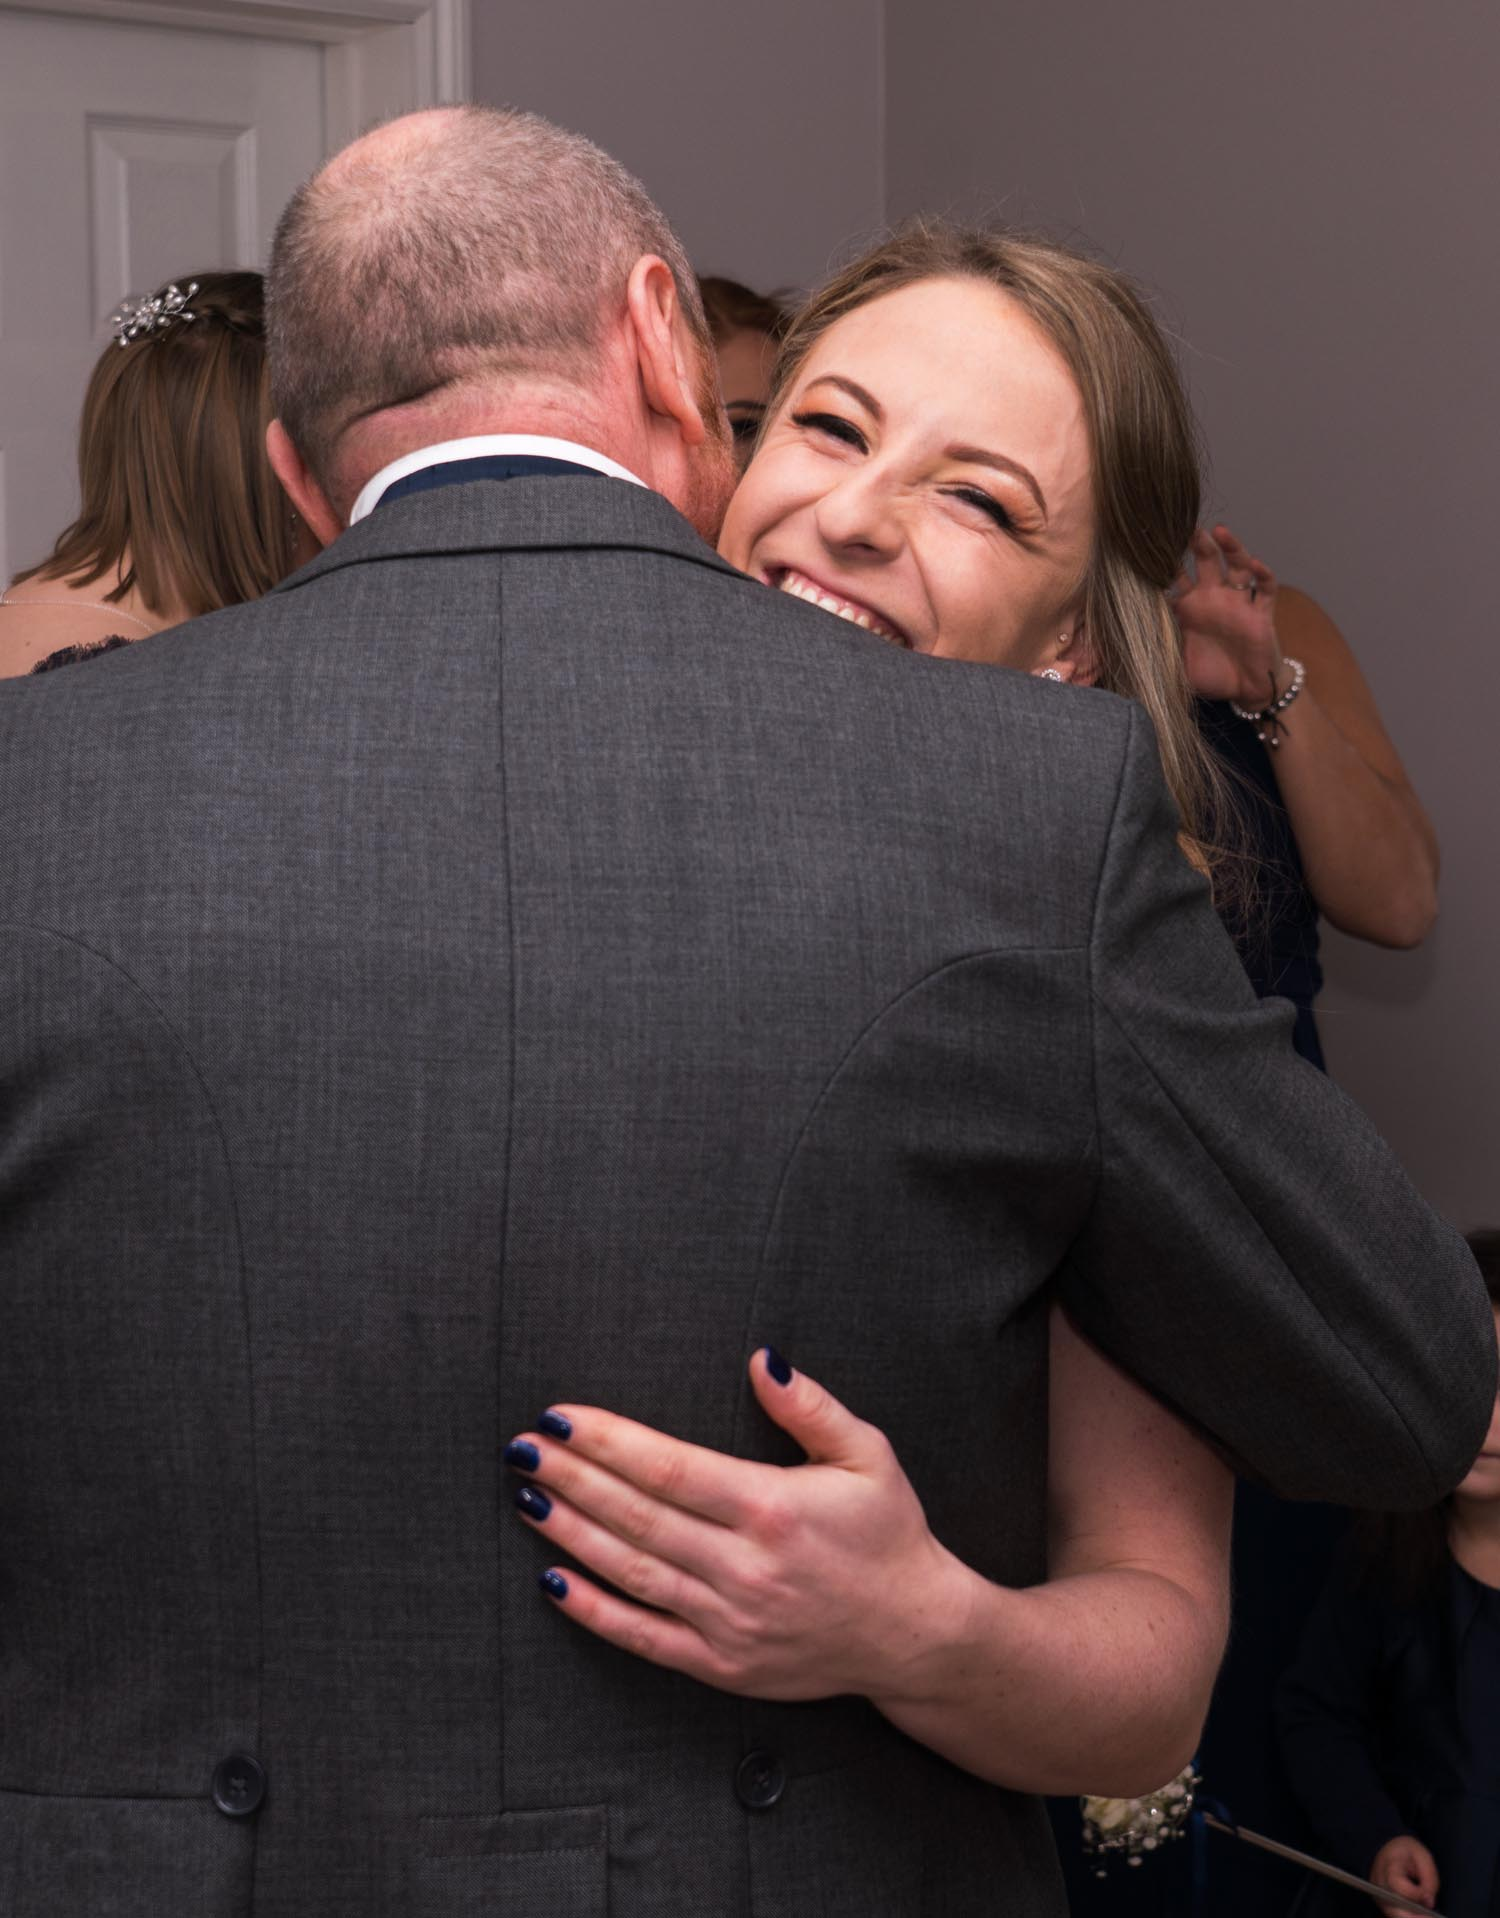 wedding-photos-bridal-preparations-ye-olde-plough-house-essex-205-2.jpg